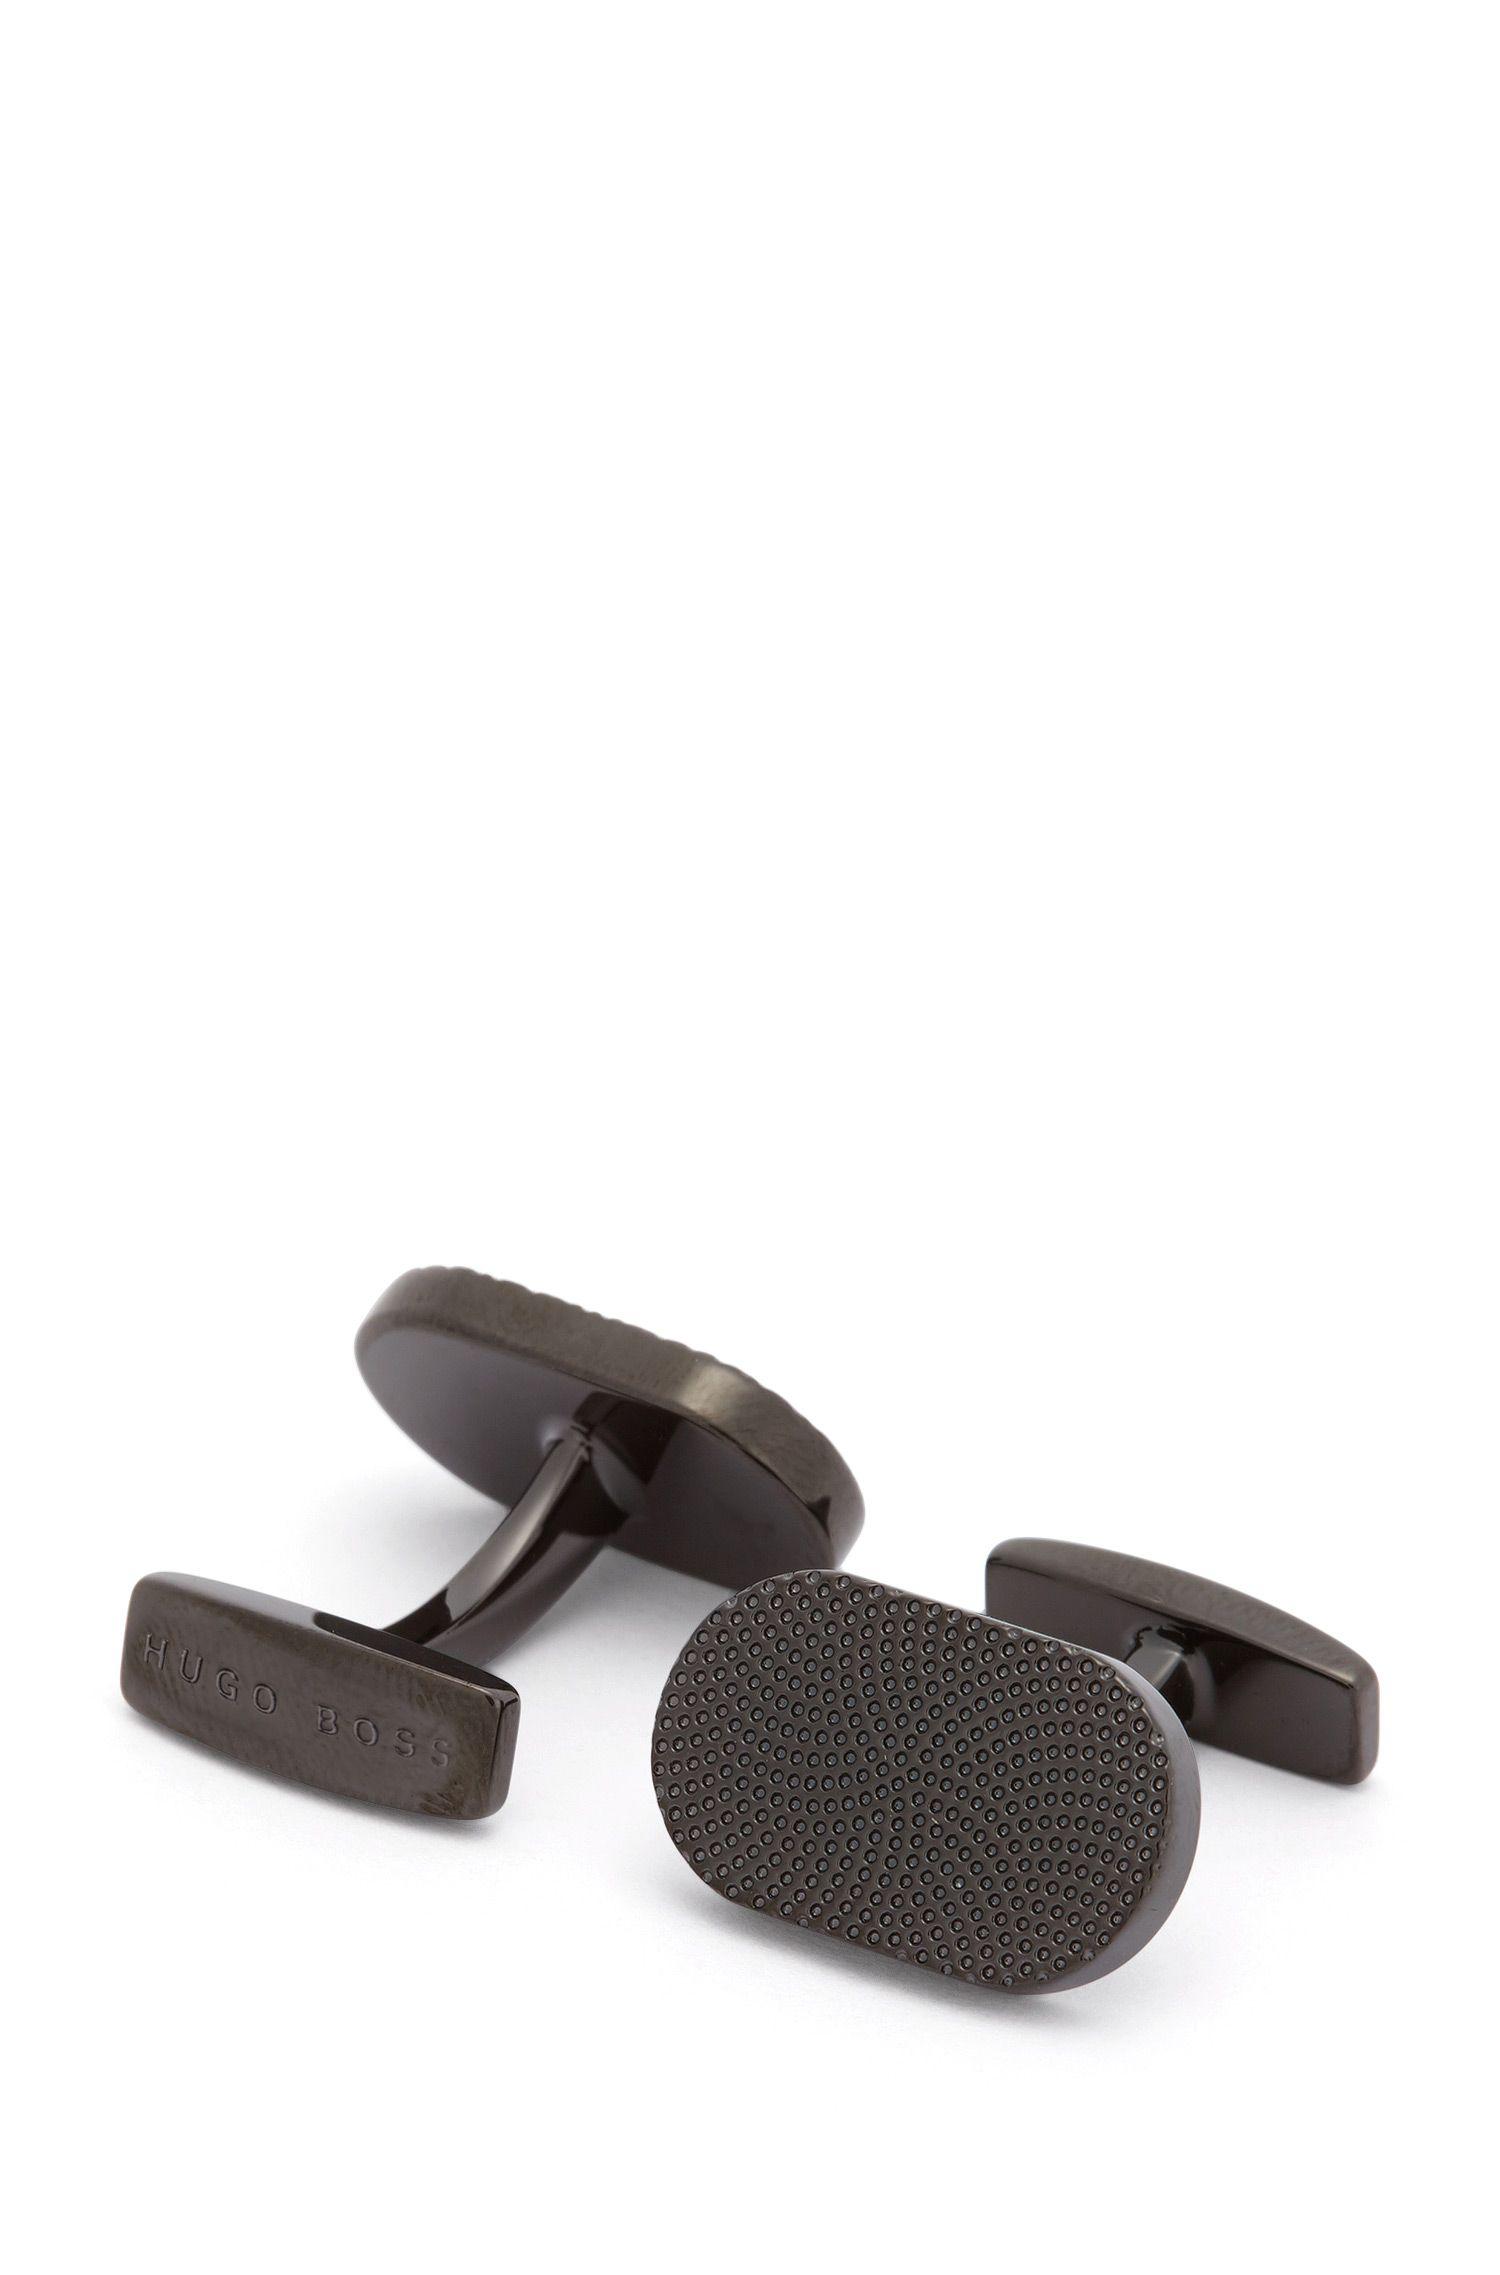 Gemelli ovali placcati neri con microdisegni